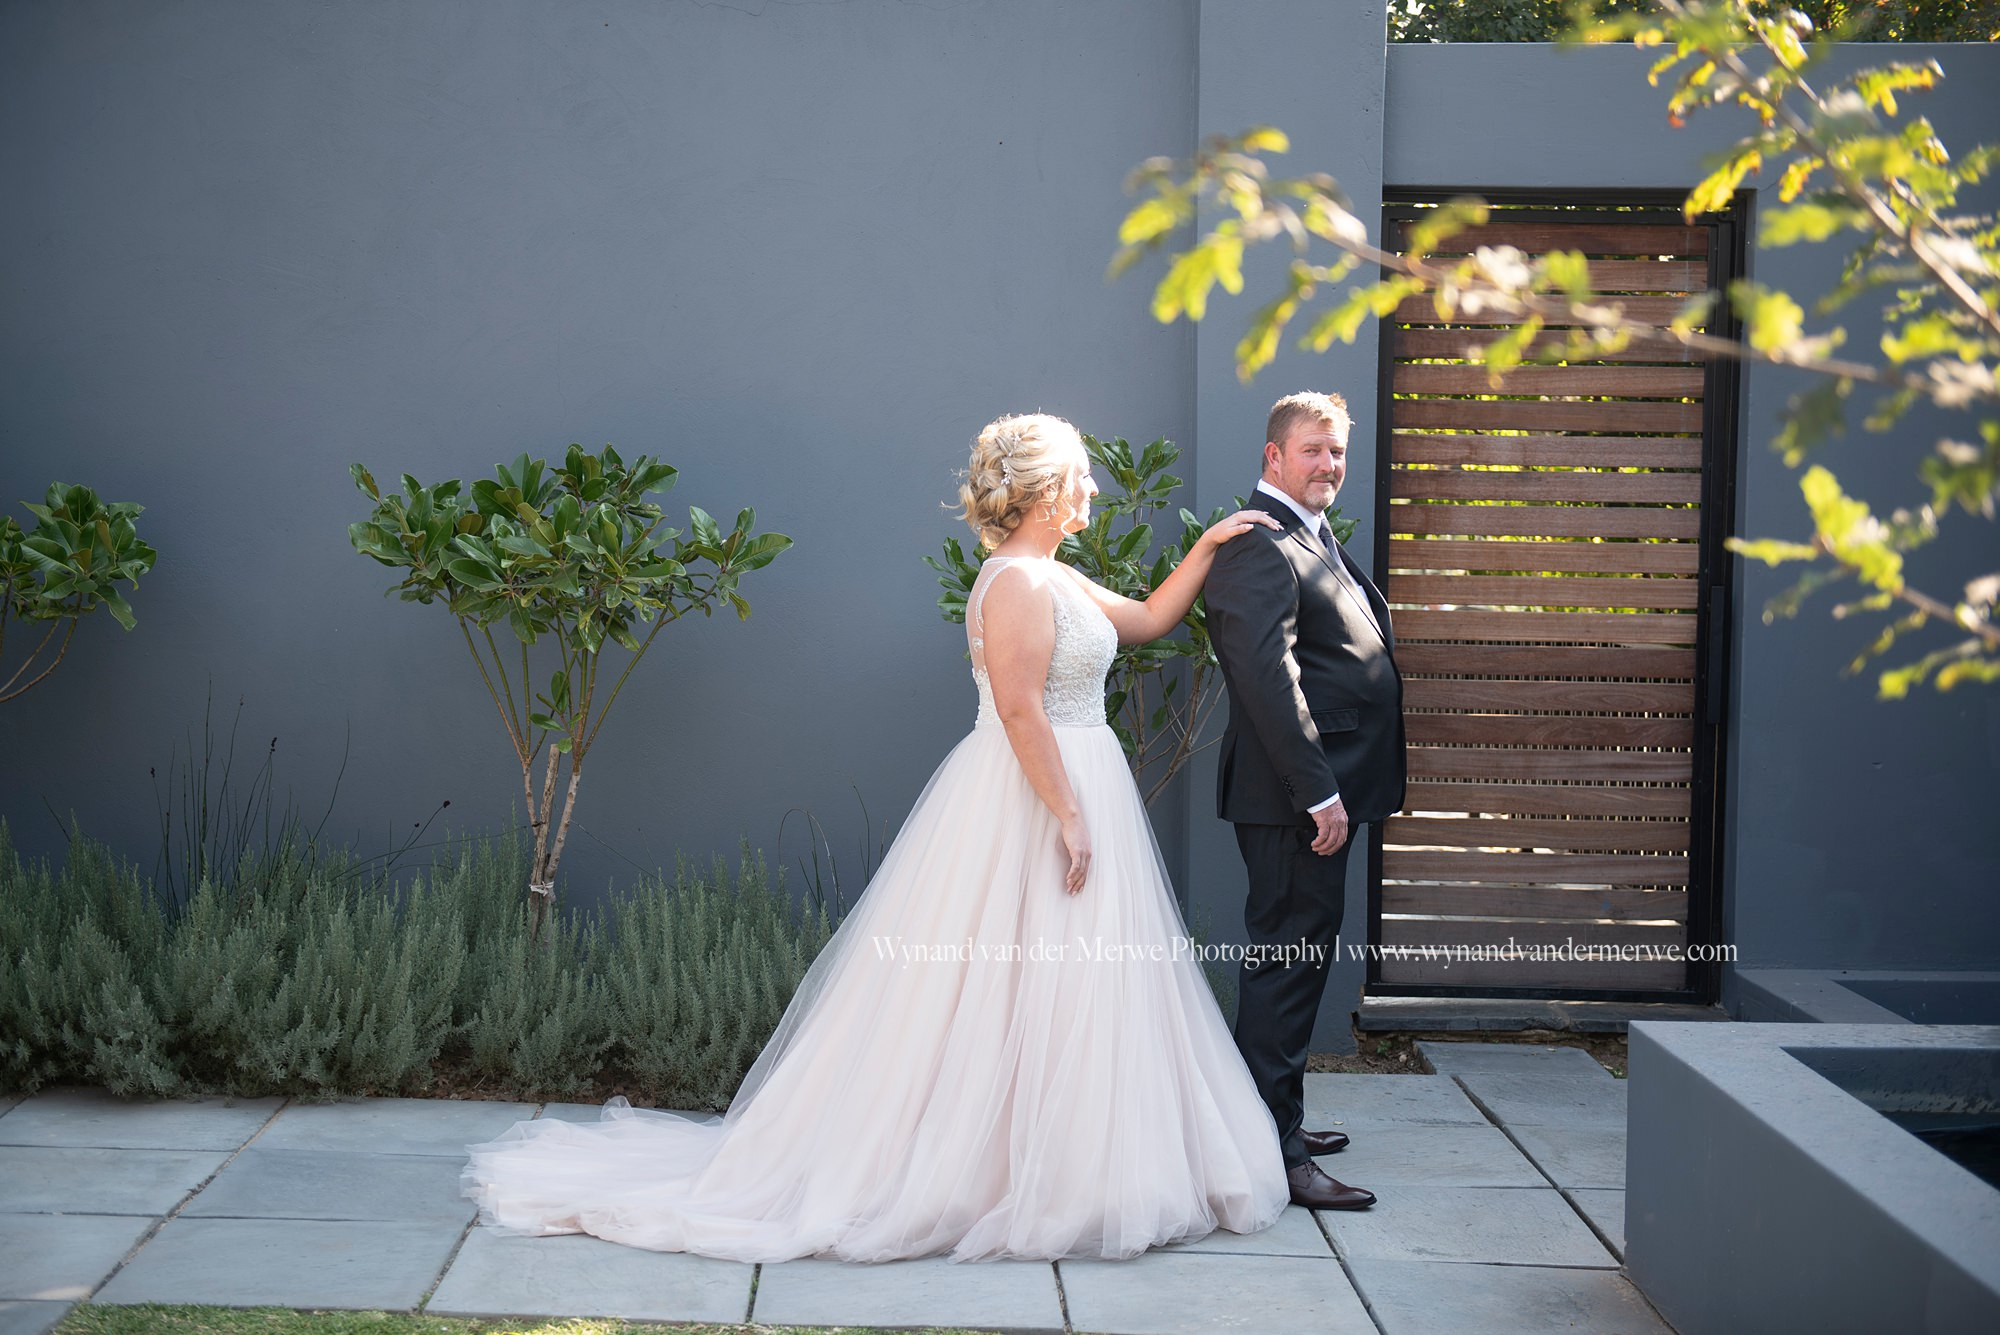 Wynandvandermerwe marcel zandrie wedding goregous inimitable wedding venue gauteng-13.jpg